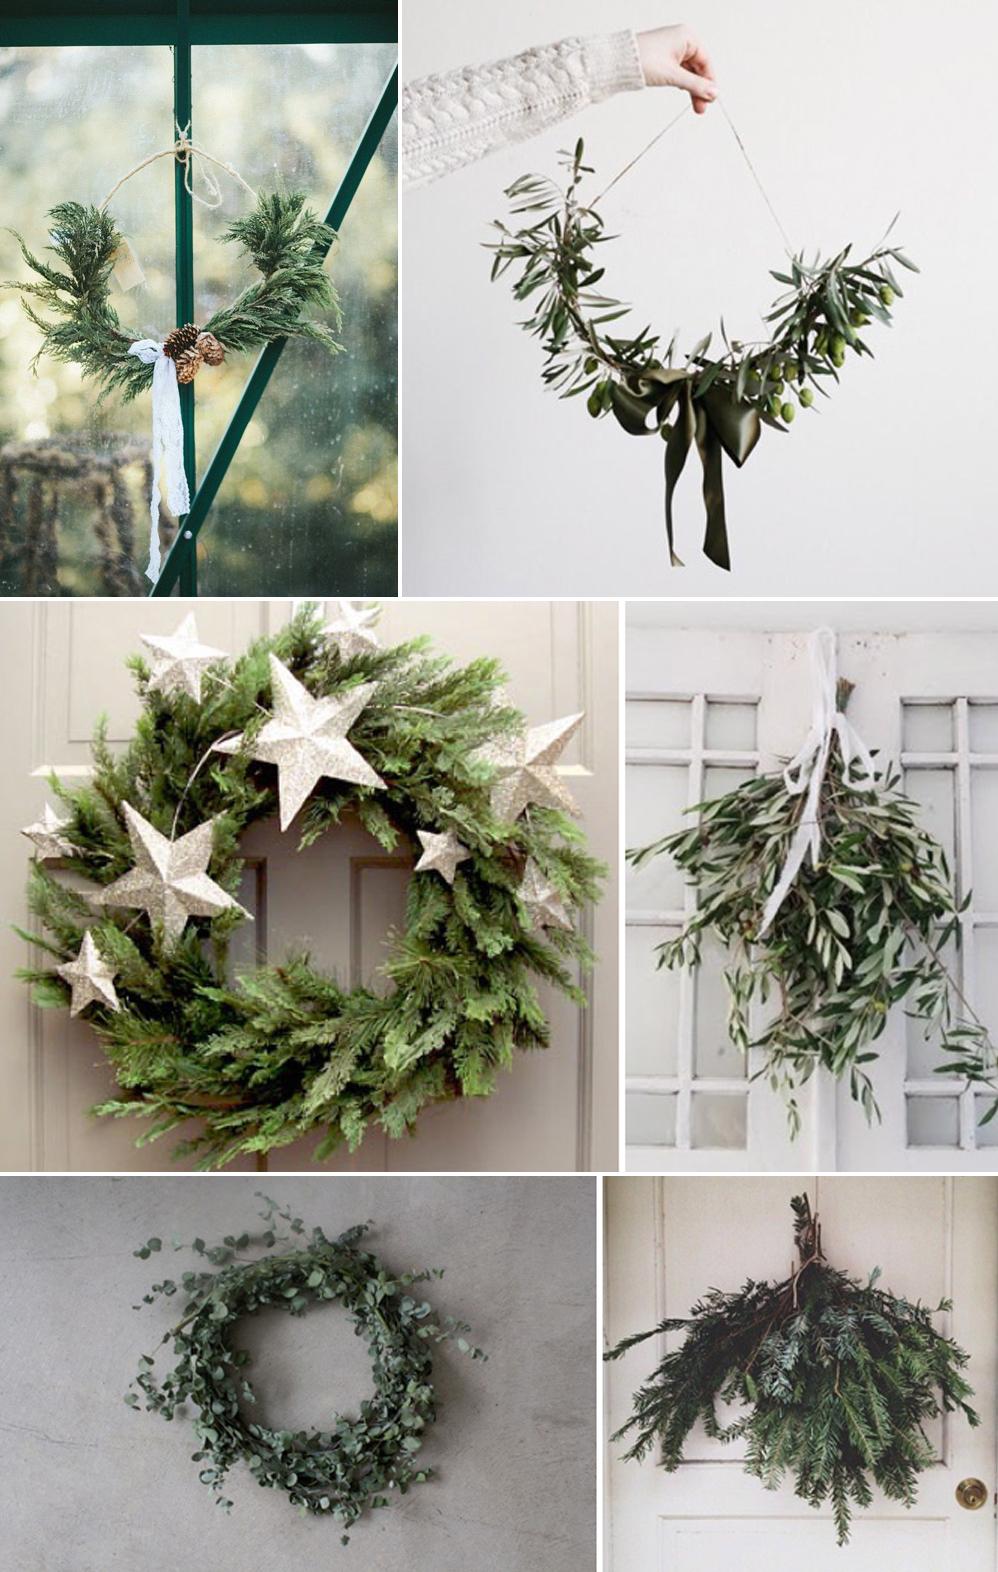 Diy the simple alternative to the christmas wreath uk wedding venues directory Diy home decor blog uk